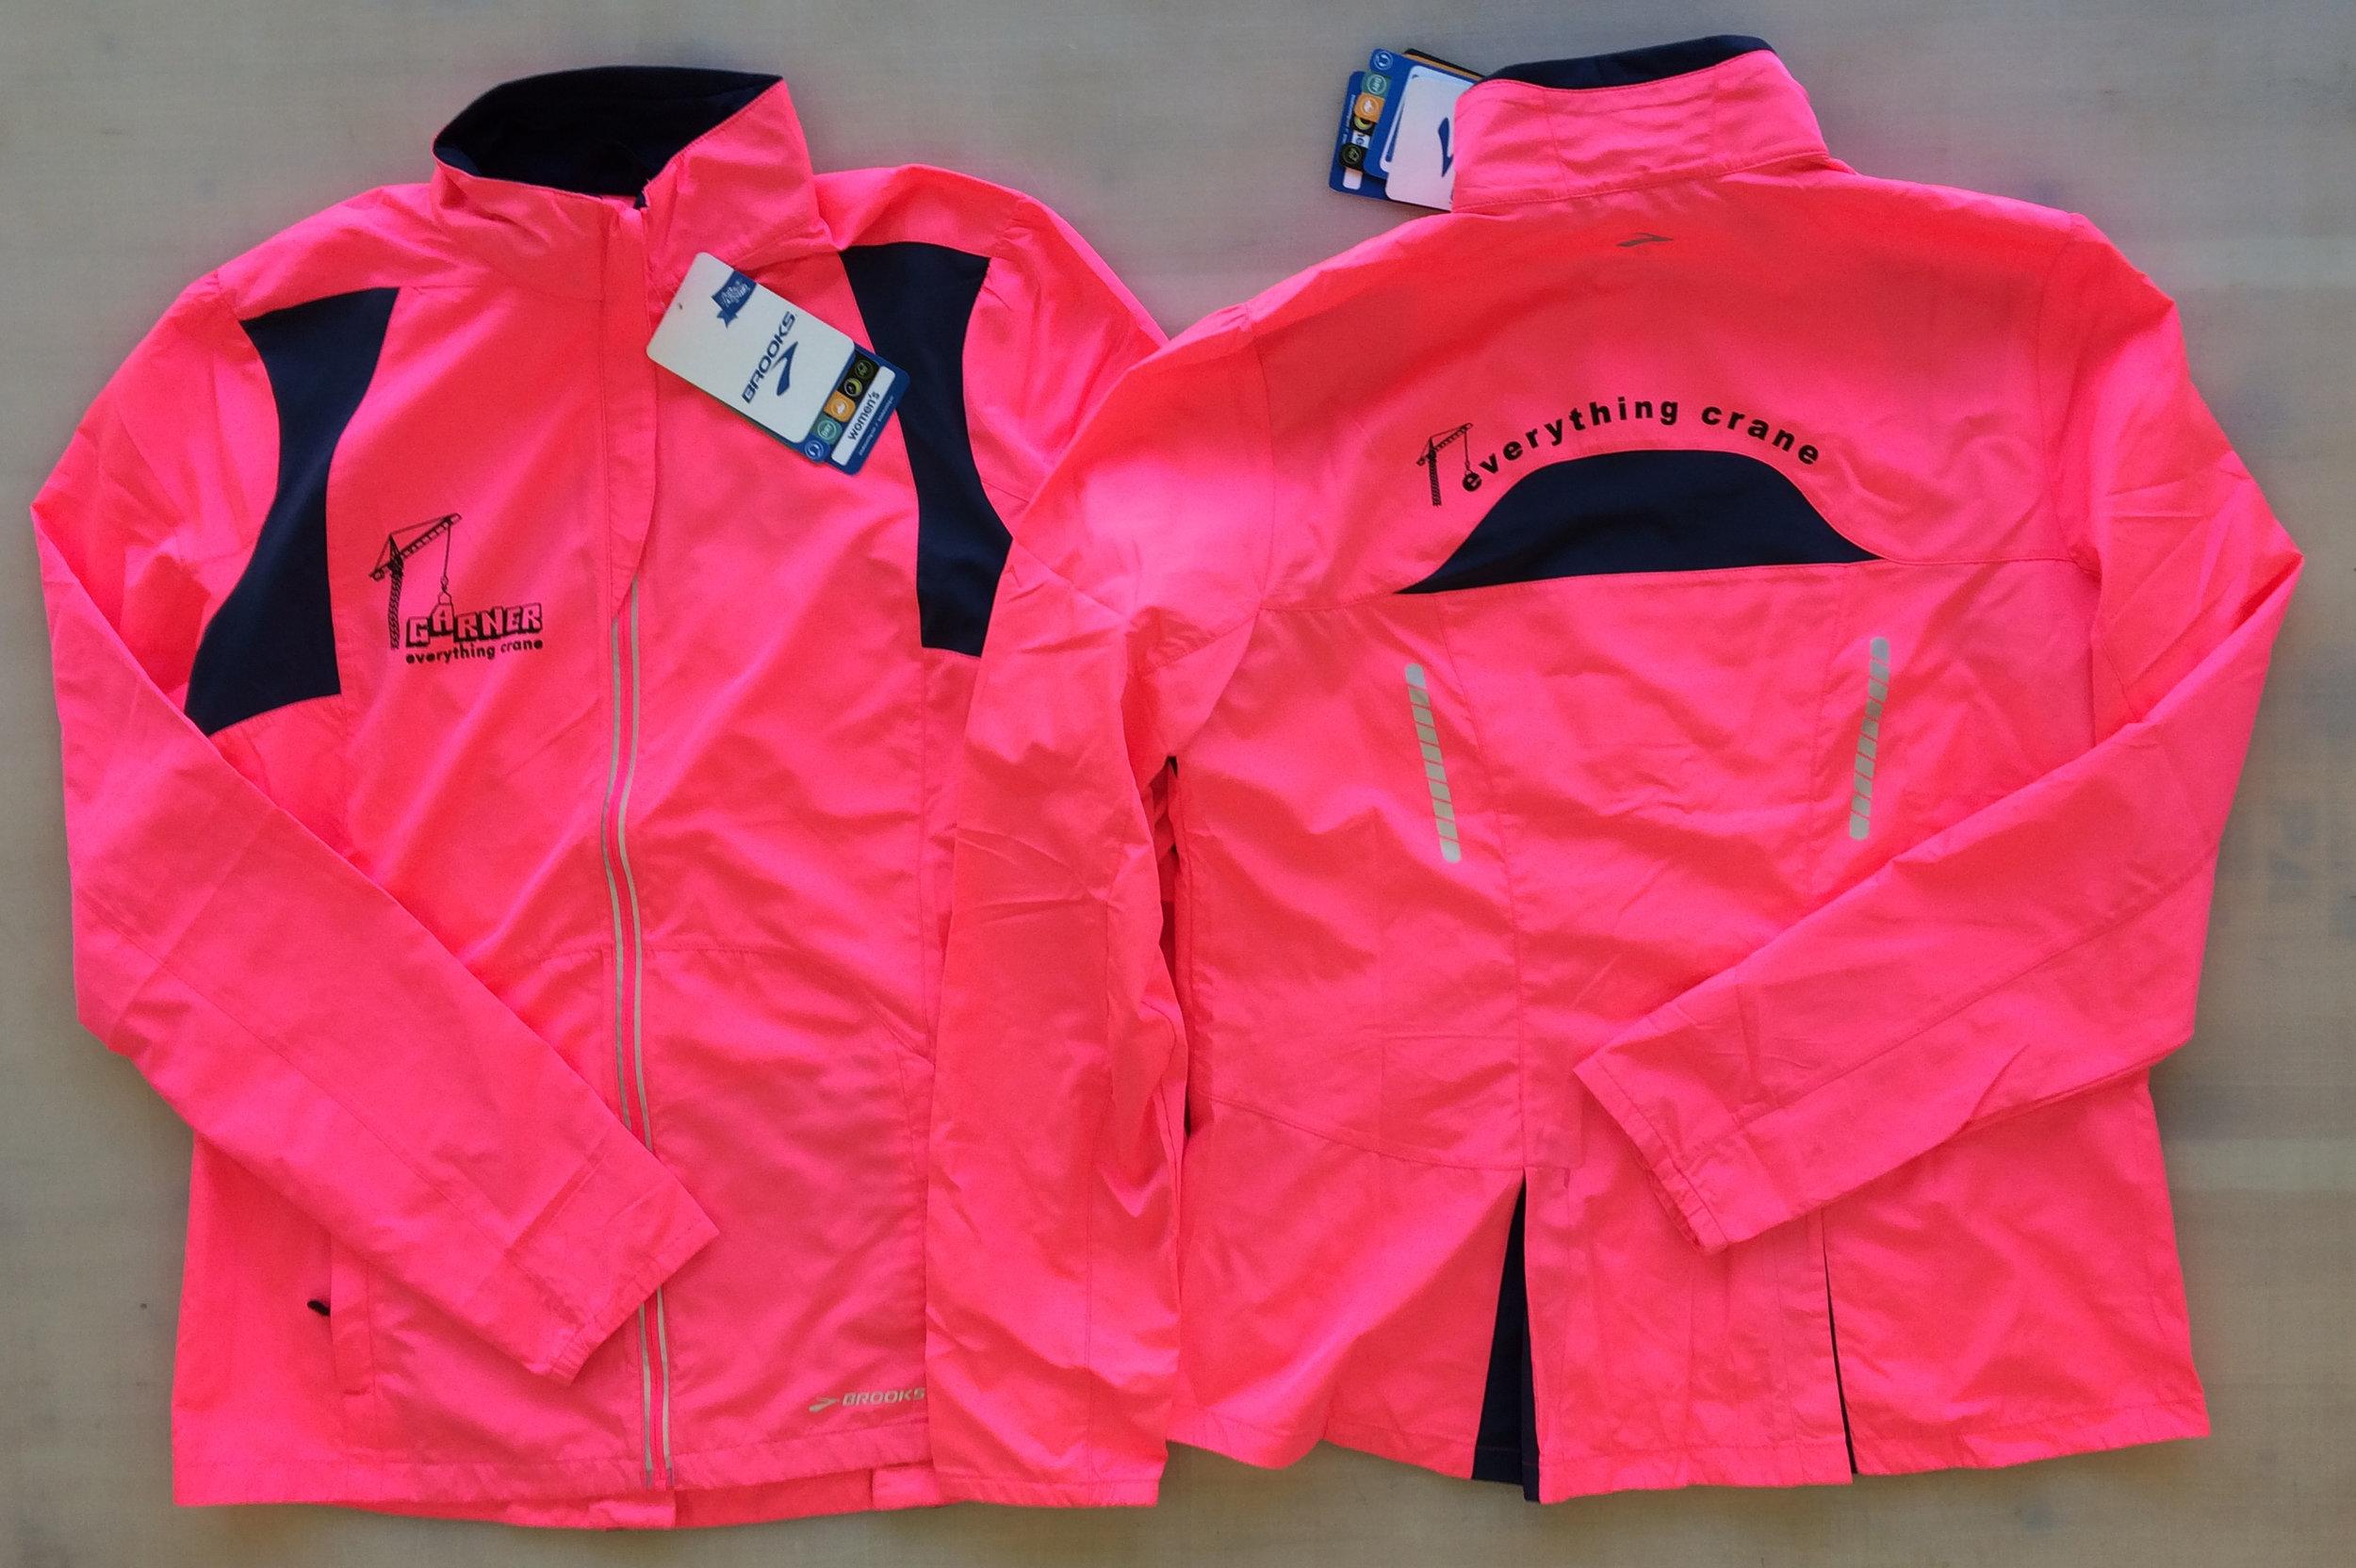 Garner_Pink Brooks Runing Jackets.jpg